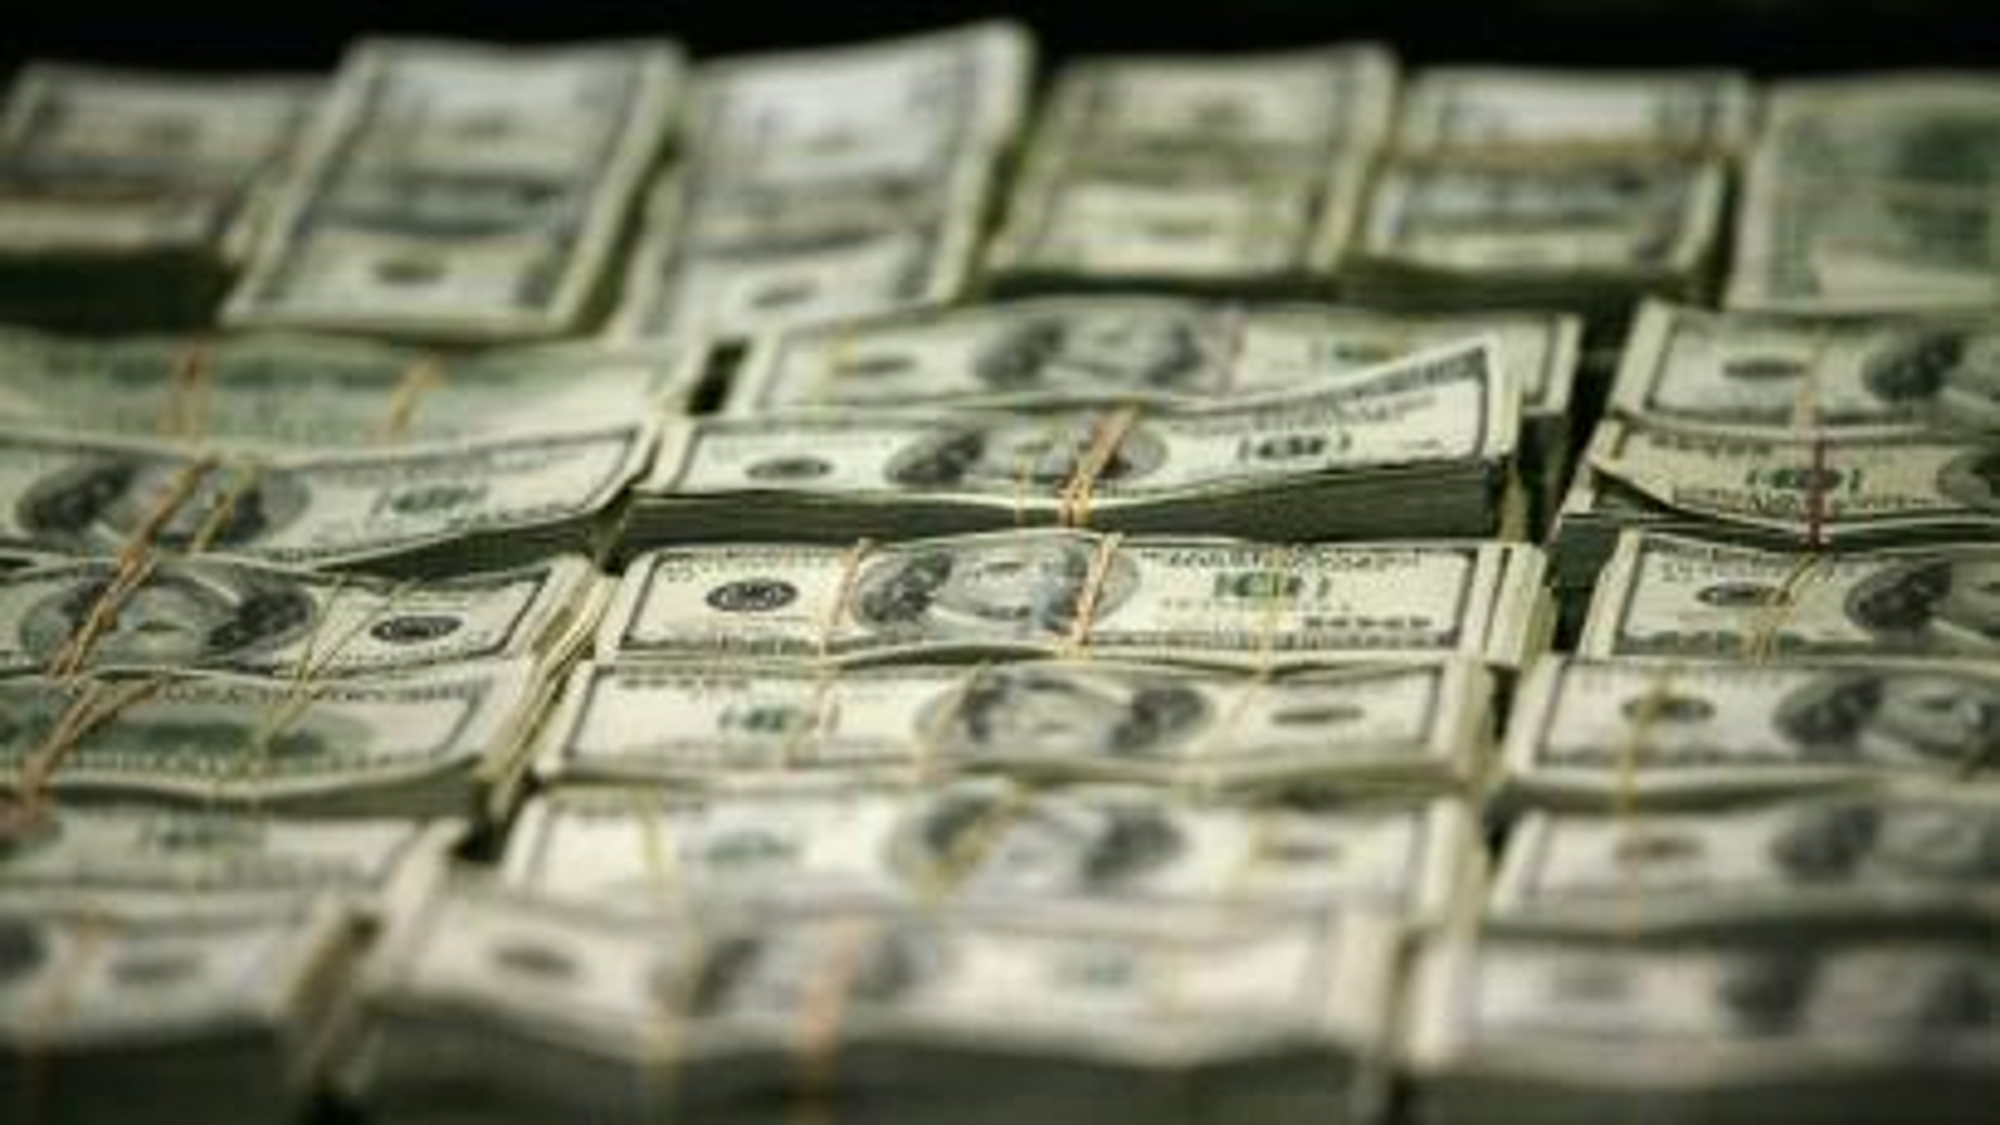 Stacks of U.S. hundred dollar bills.